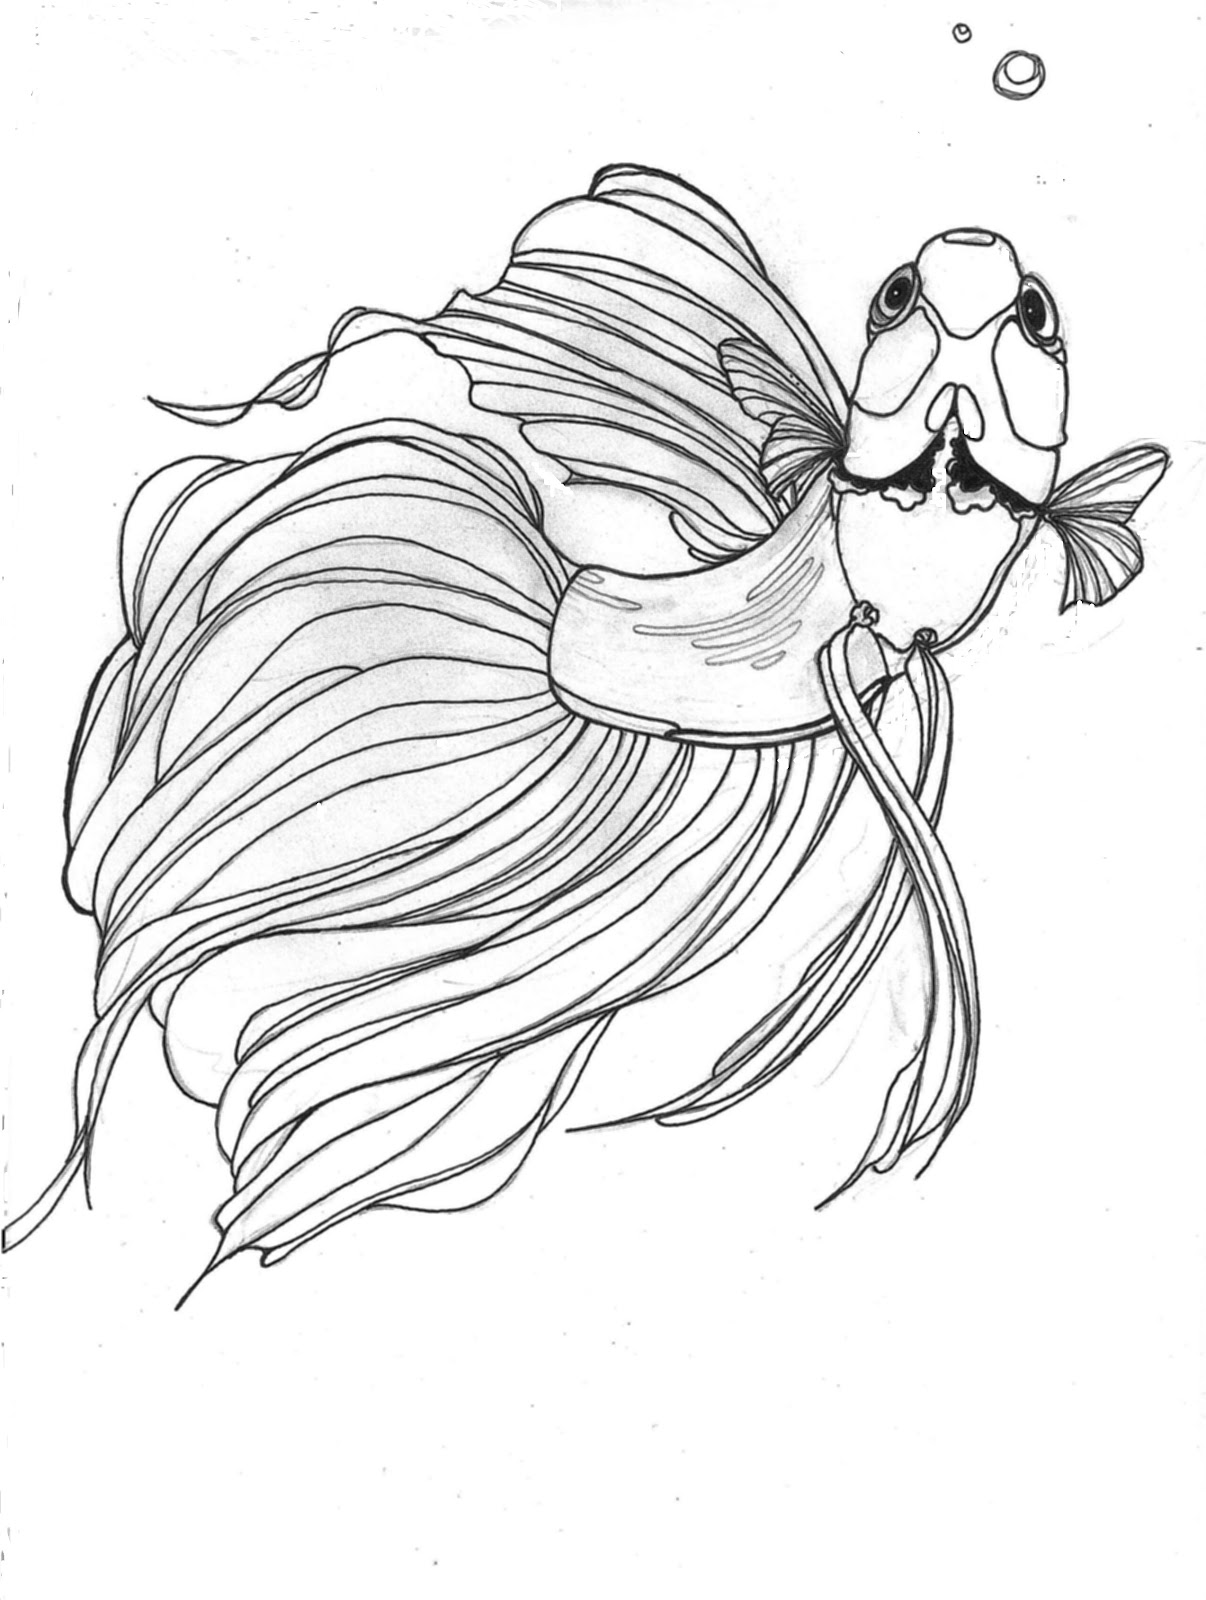 Desenhos do Peixe Betta para Colorir